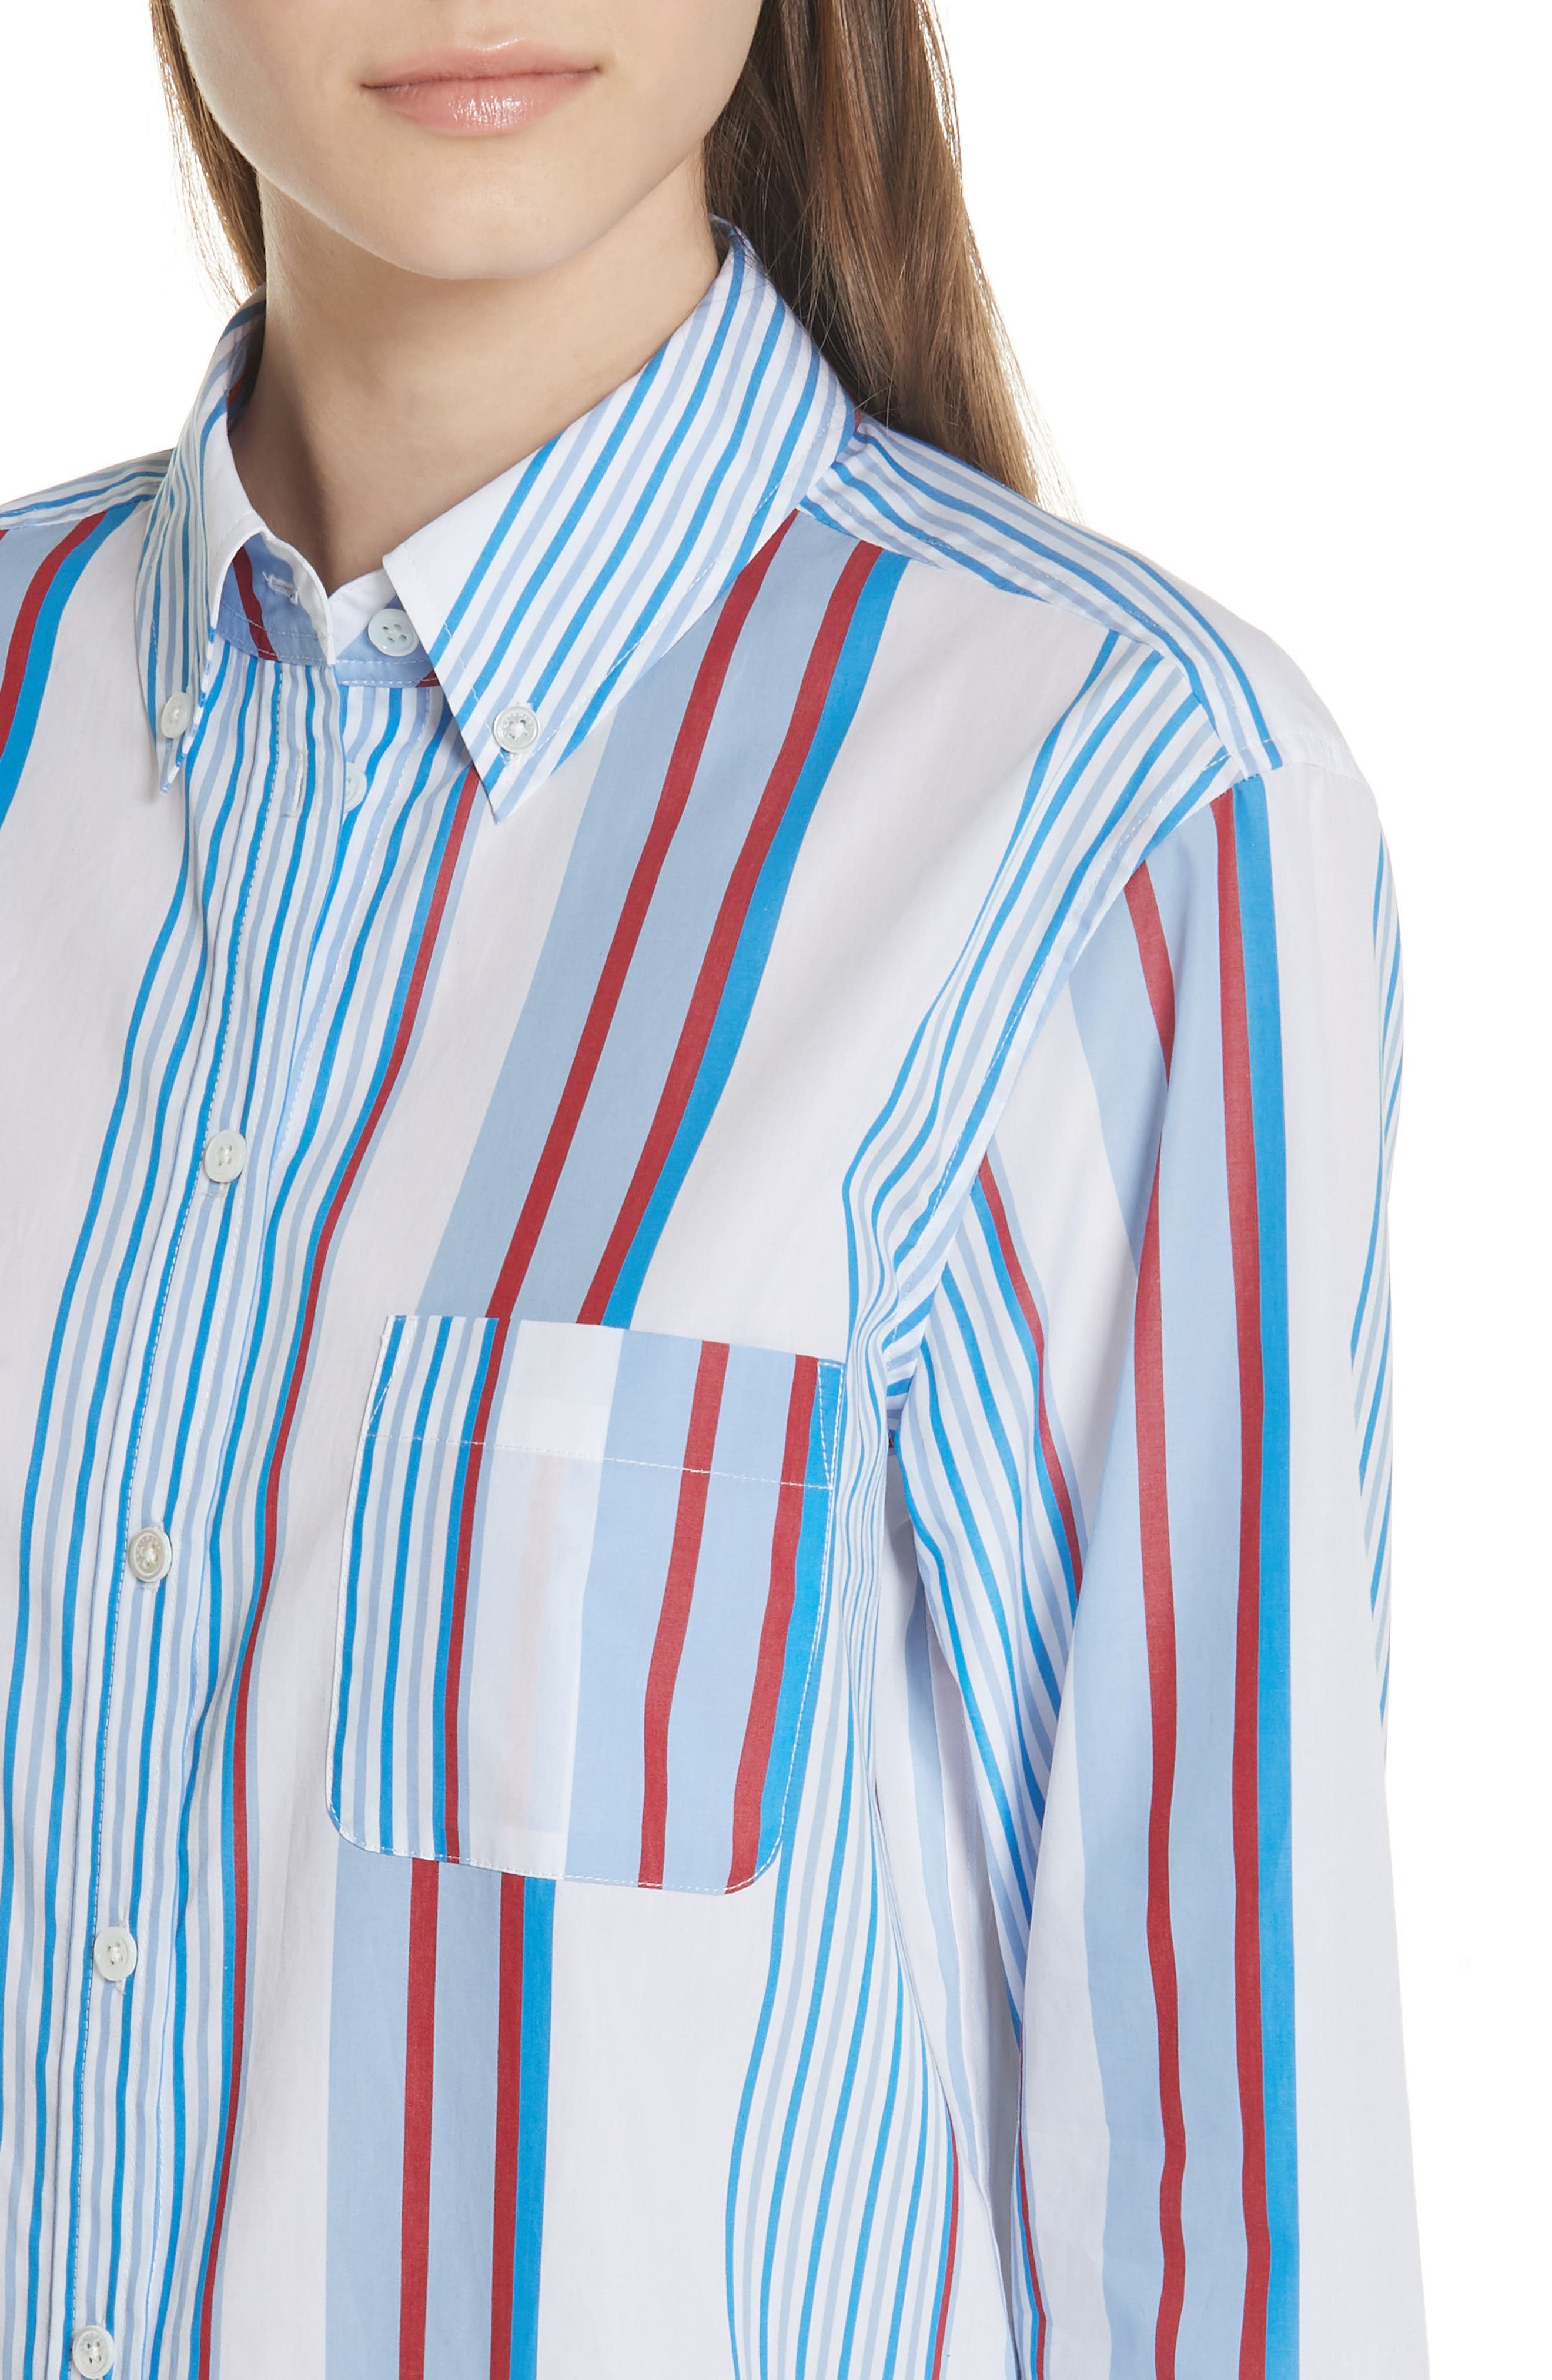 Margaux Stripe Shirt,                             Alternate thumbnail 4, color,                             419